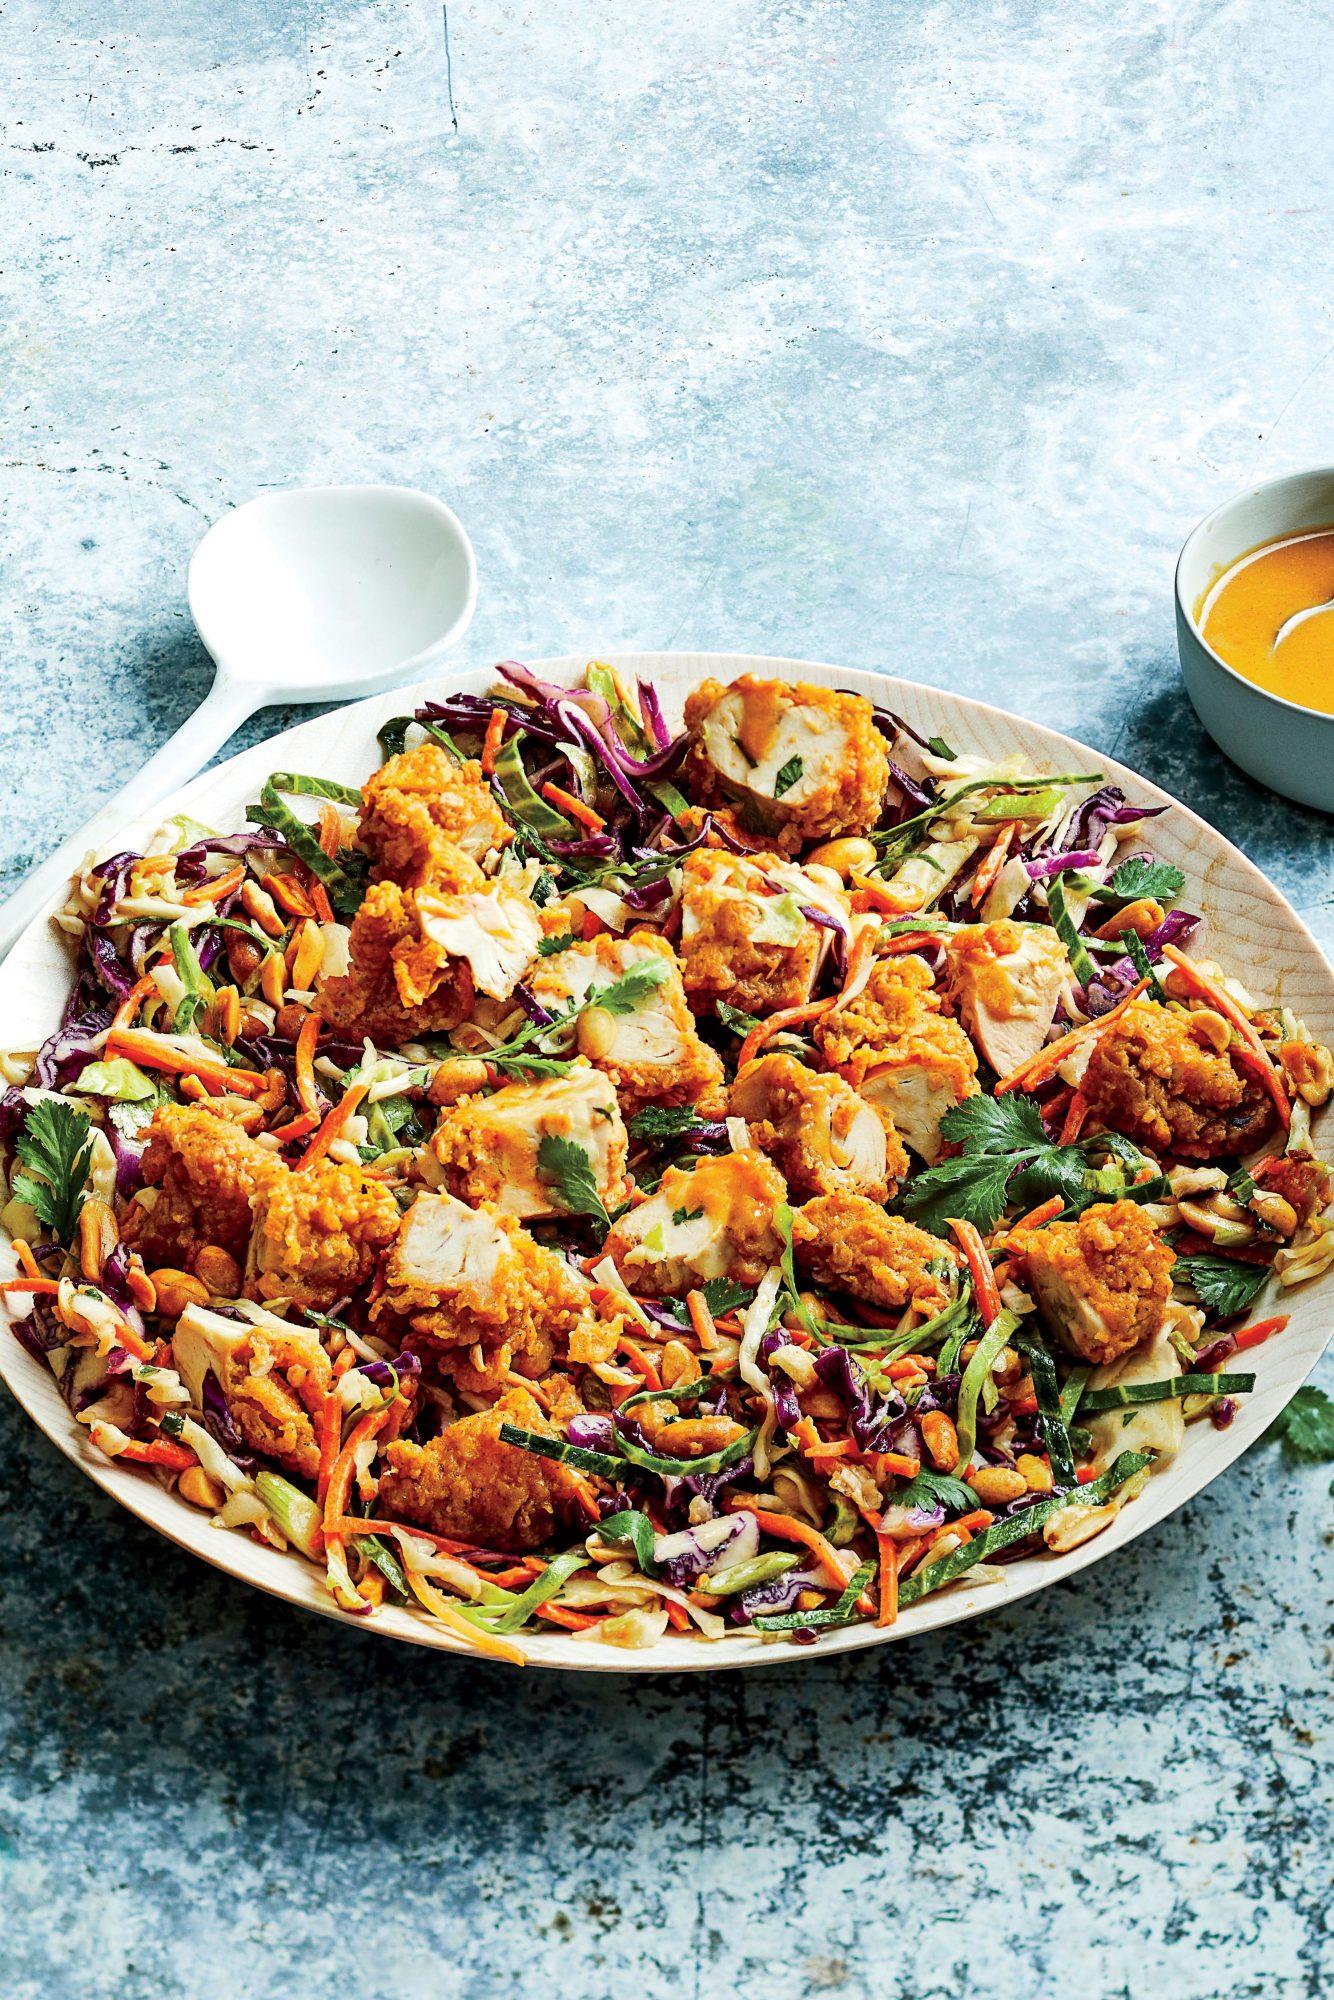 Crunchy Chicken-Peanut Chopped Salad